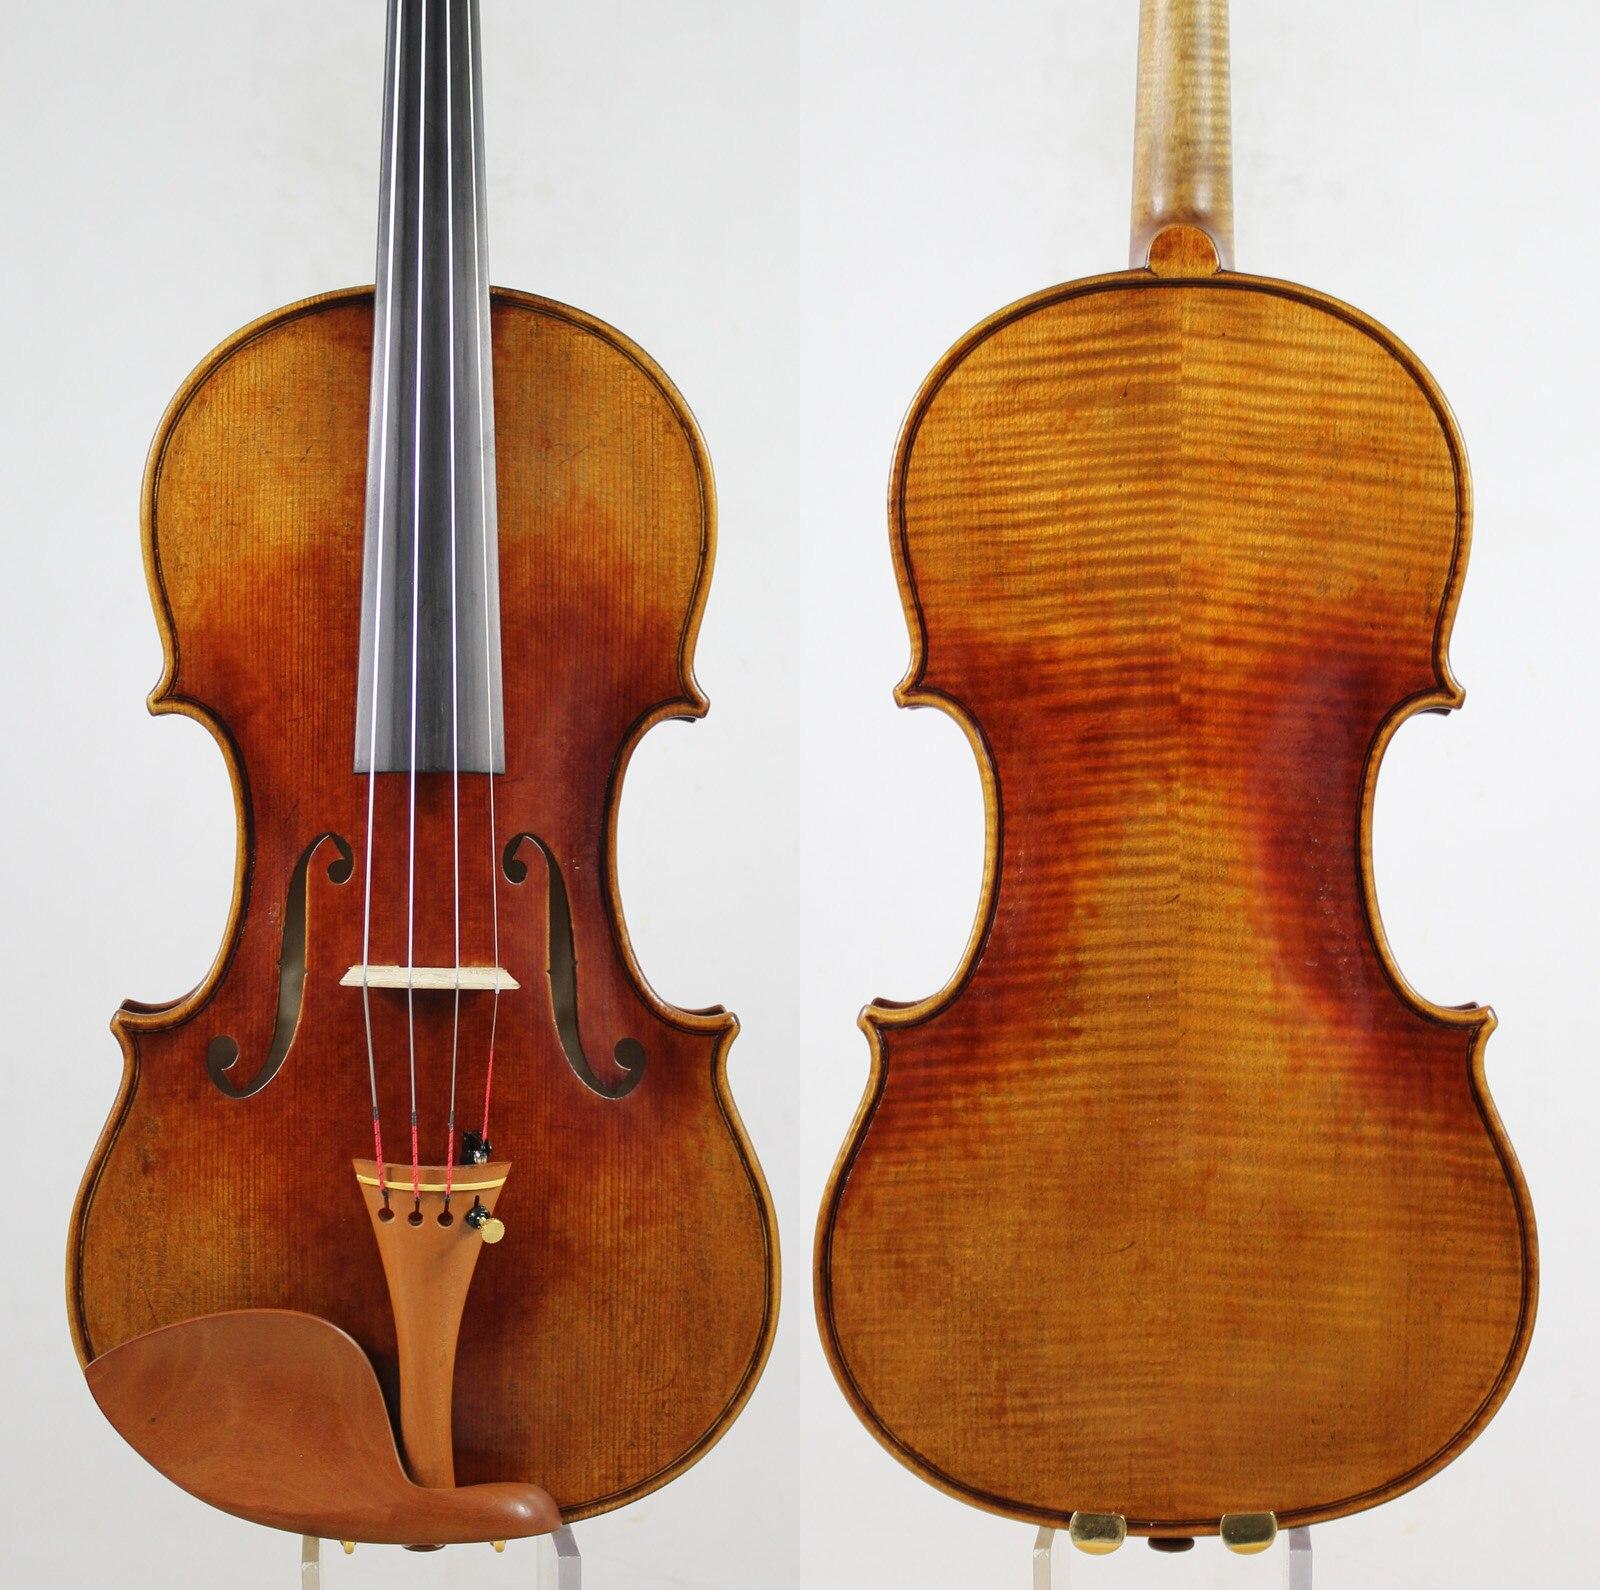 "Guarnieri Ole Bull' 1744 Violin violino Copy .""All European Wood"" ,oil varnish!Best performance!Free Shippin, Case,Bow!"